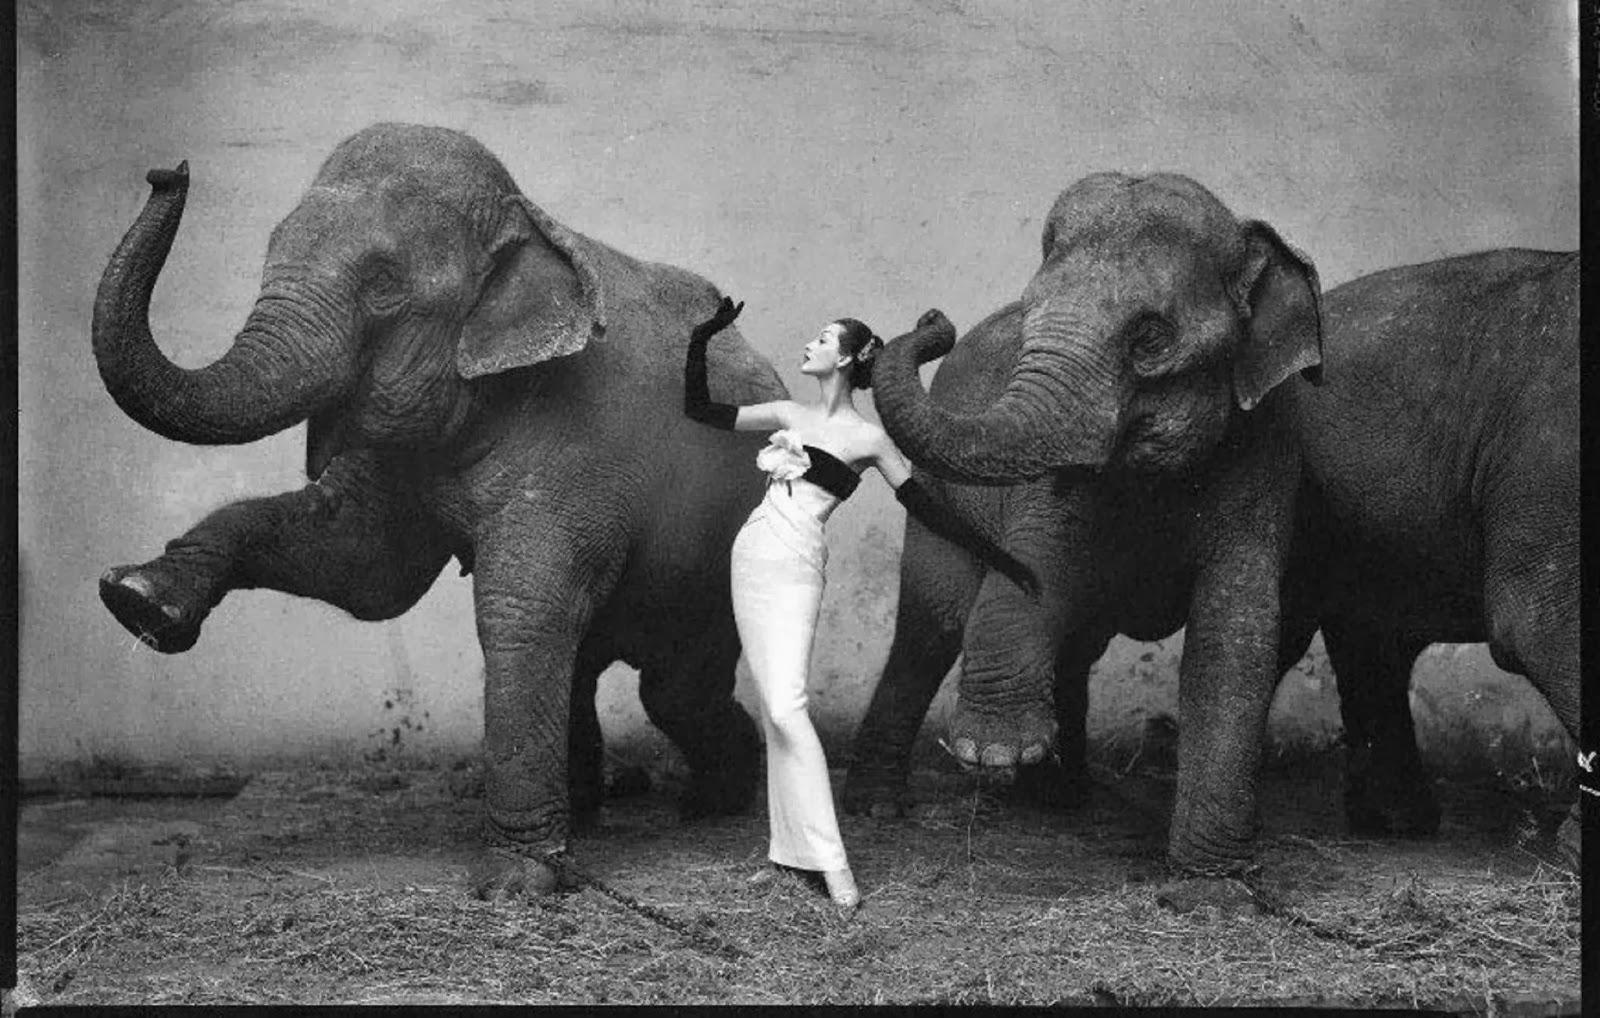 dovima-with-the-elephants.jpg